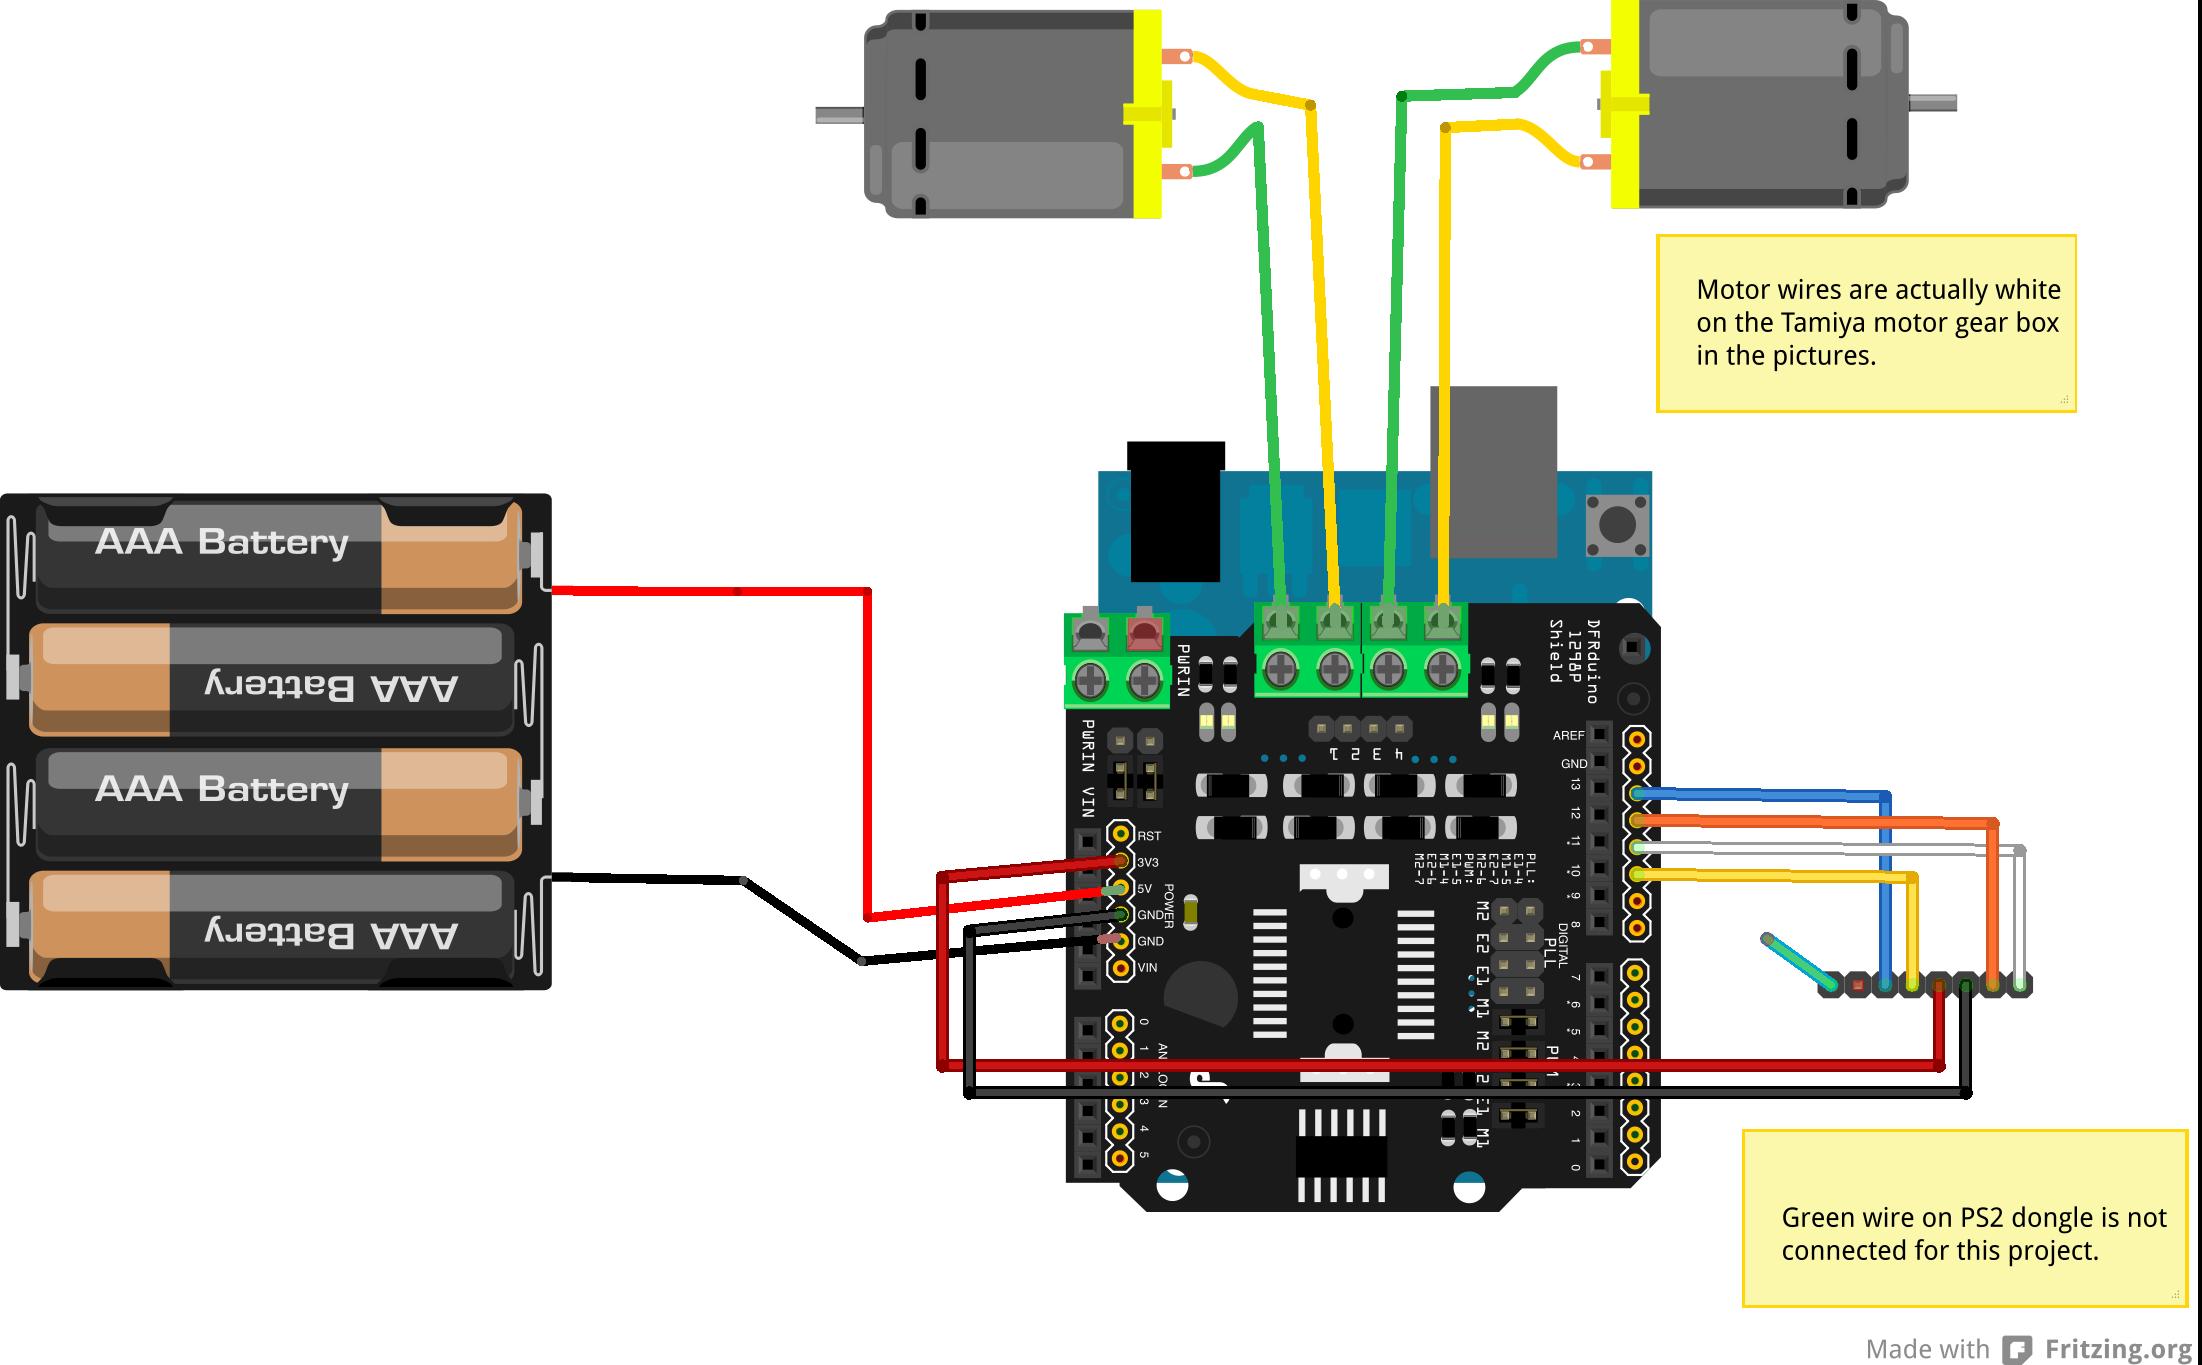 rc helicopter wiring diagram 19 7 fearless wonder de \u2022rc tank diagram  5 6 kenmo